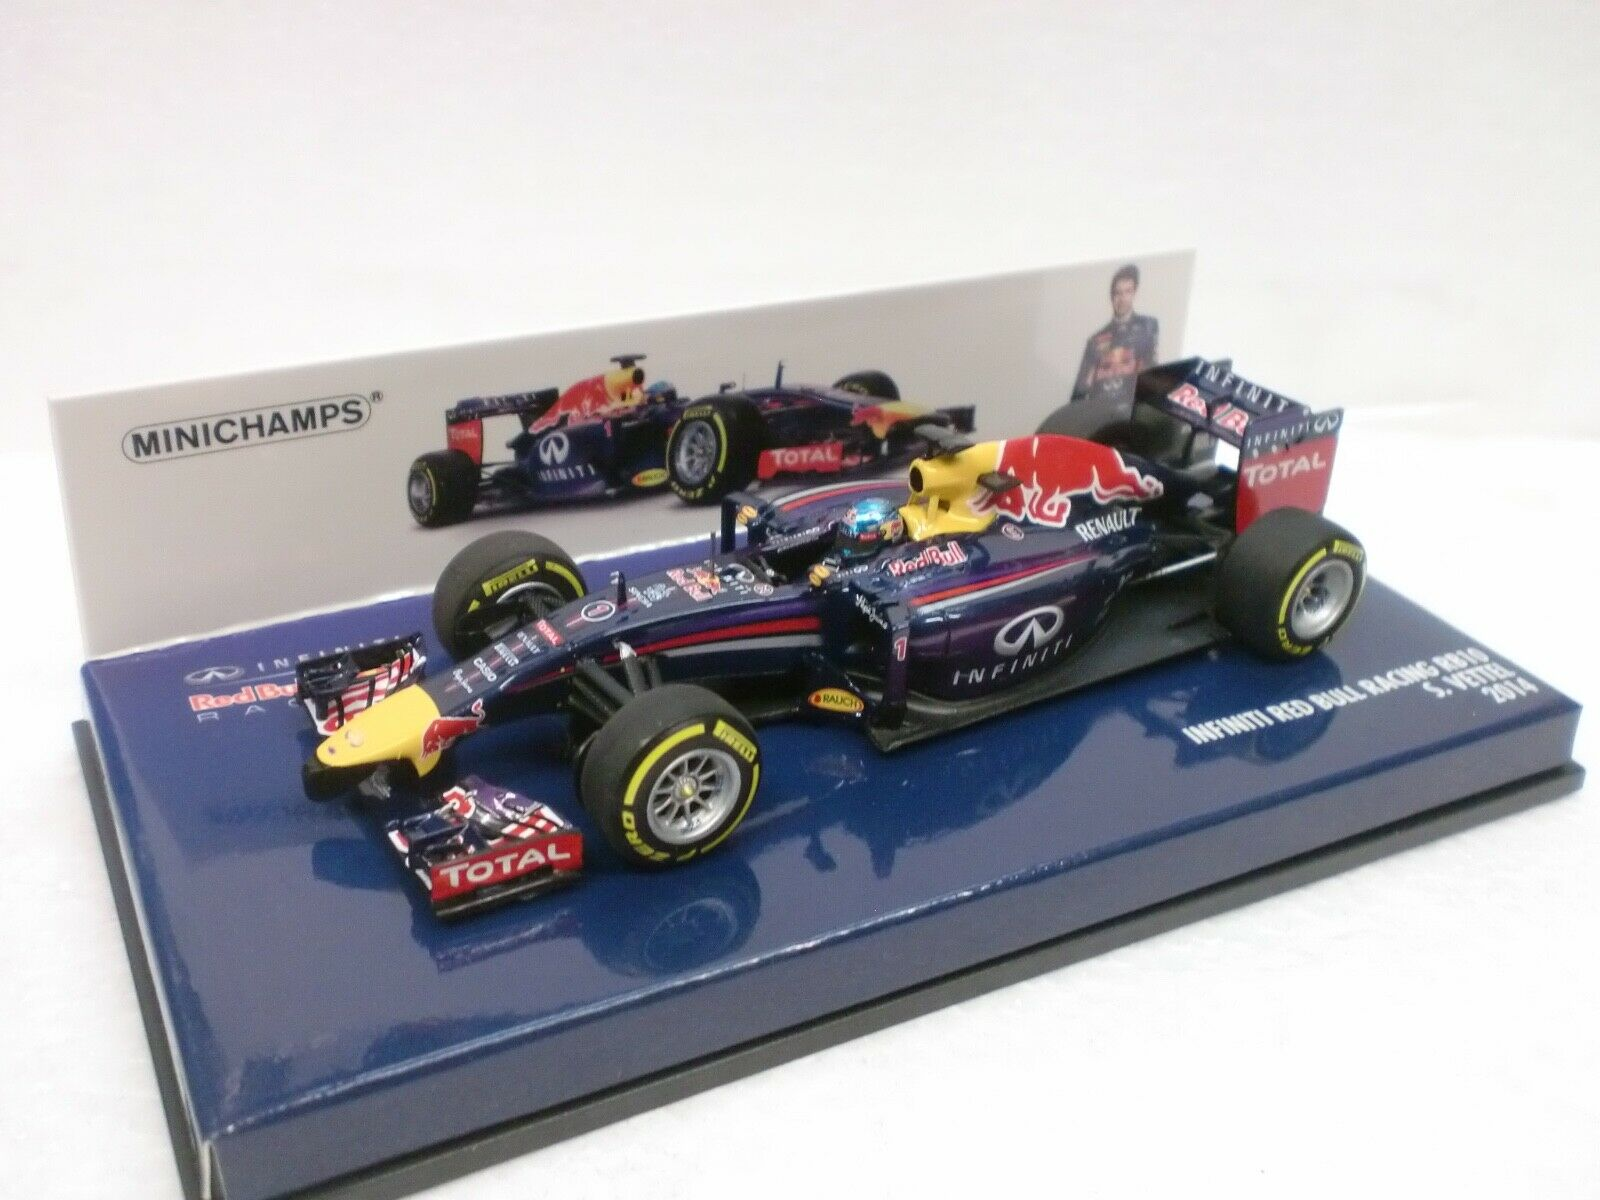 MINICHAMPS  - F1 INFINITI rosso BULL RACING RB10 - S. VETTEL